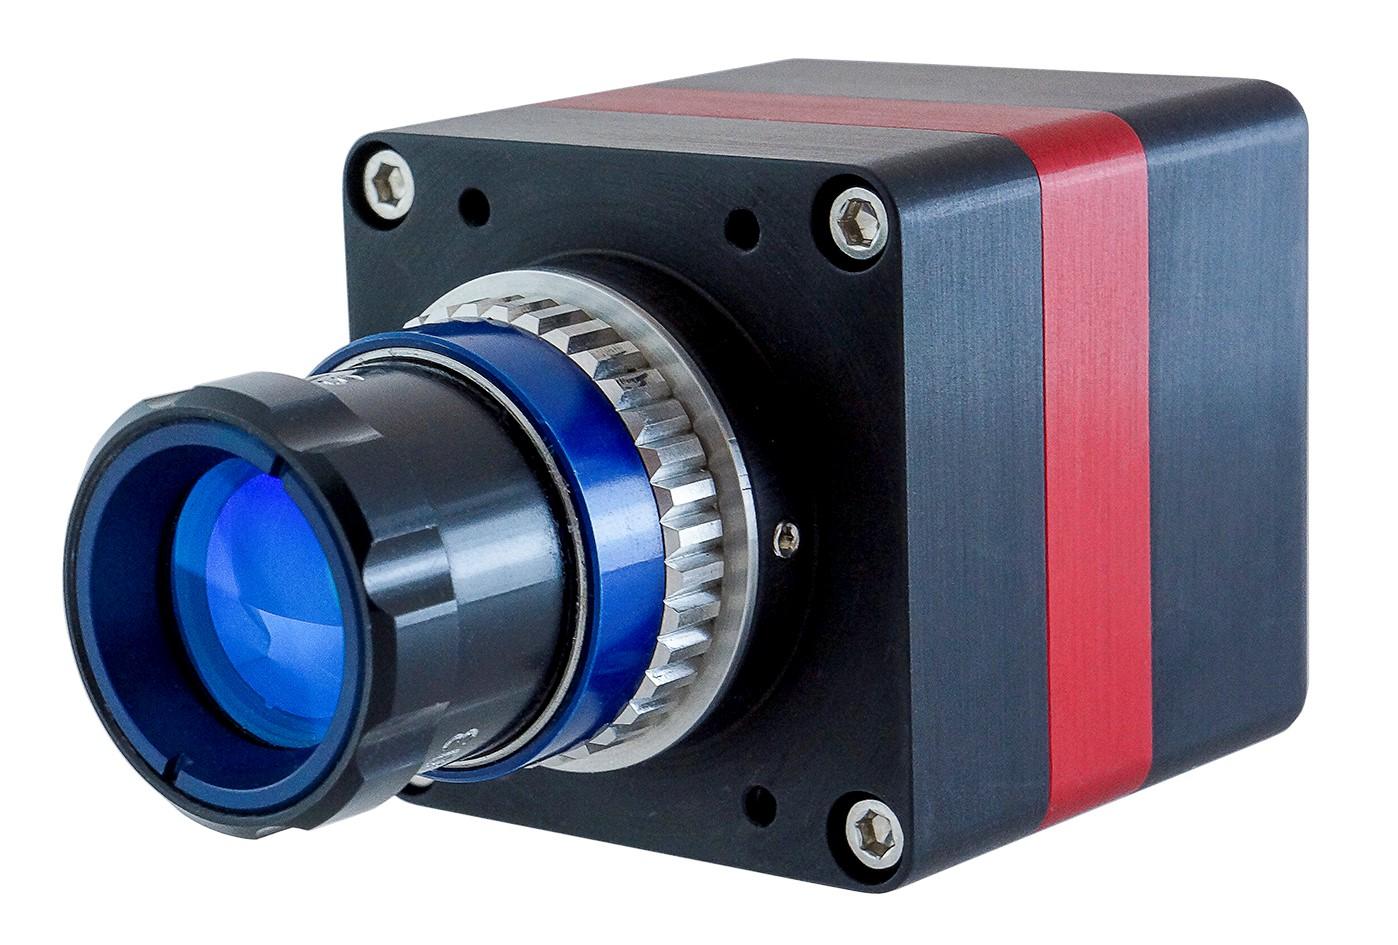 OWL 1280 VIS-SWIR Camera